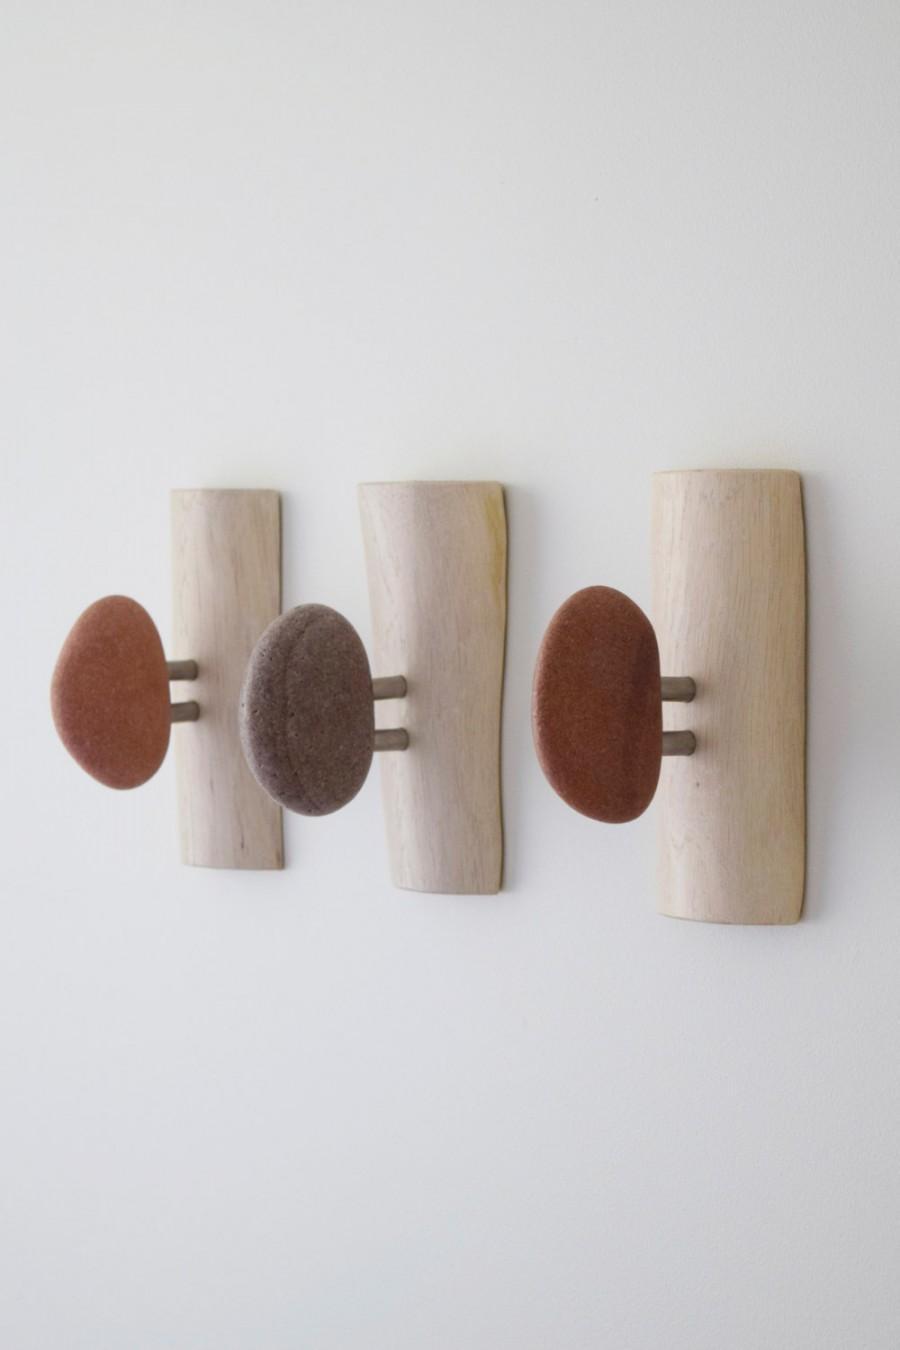 Stone Hooks Towel Bathroom Wall Holder Bar Rustic Shelf 3 Pcs